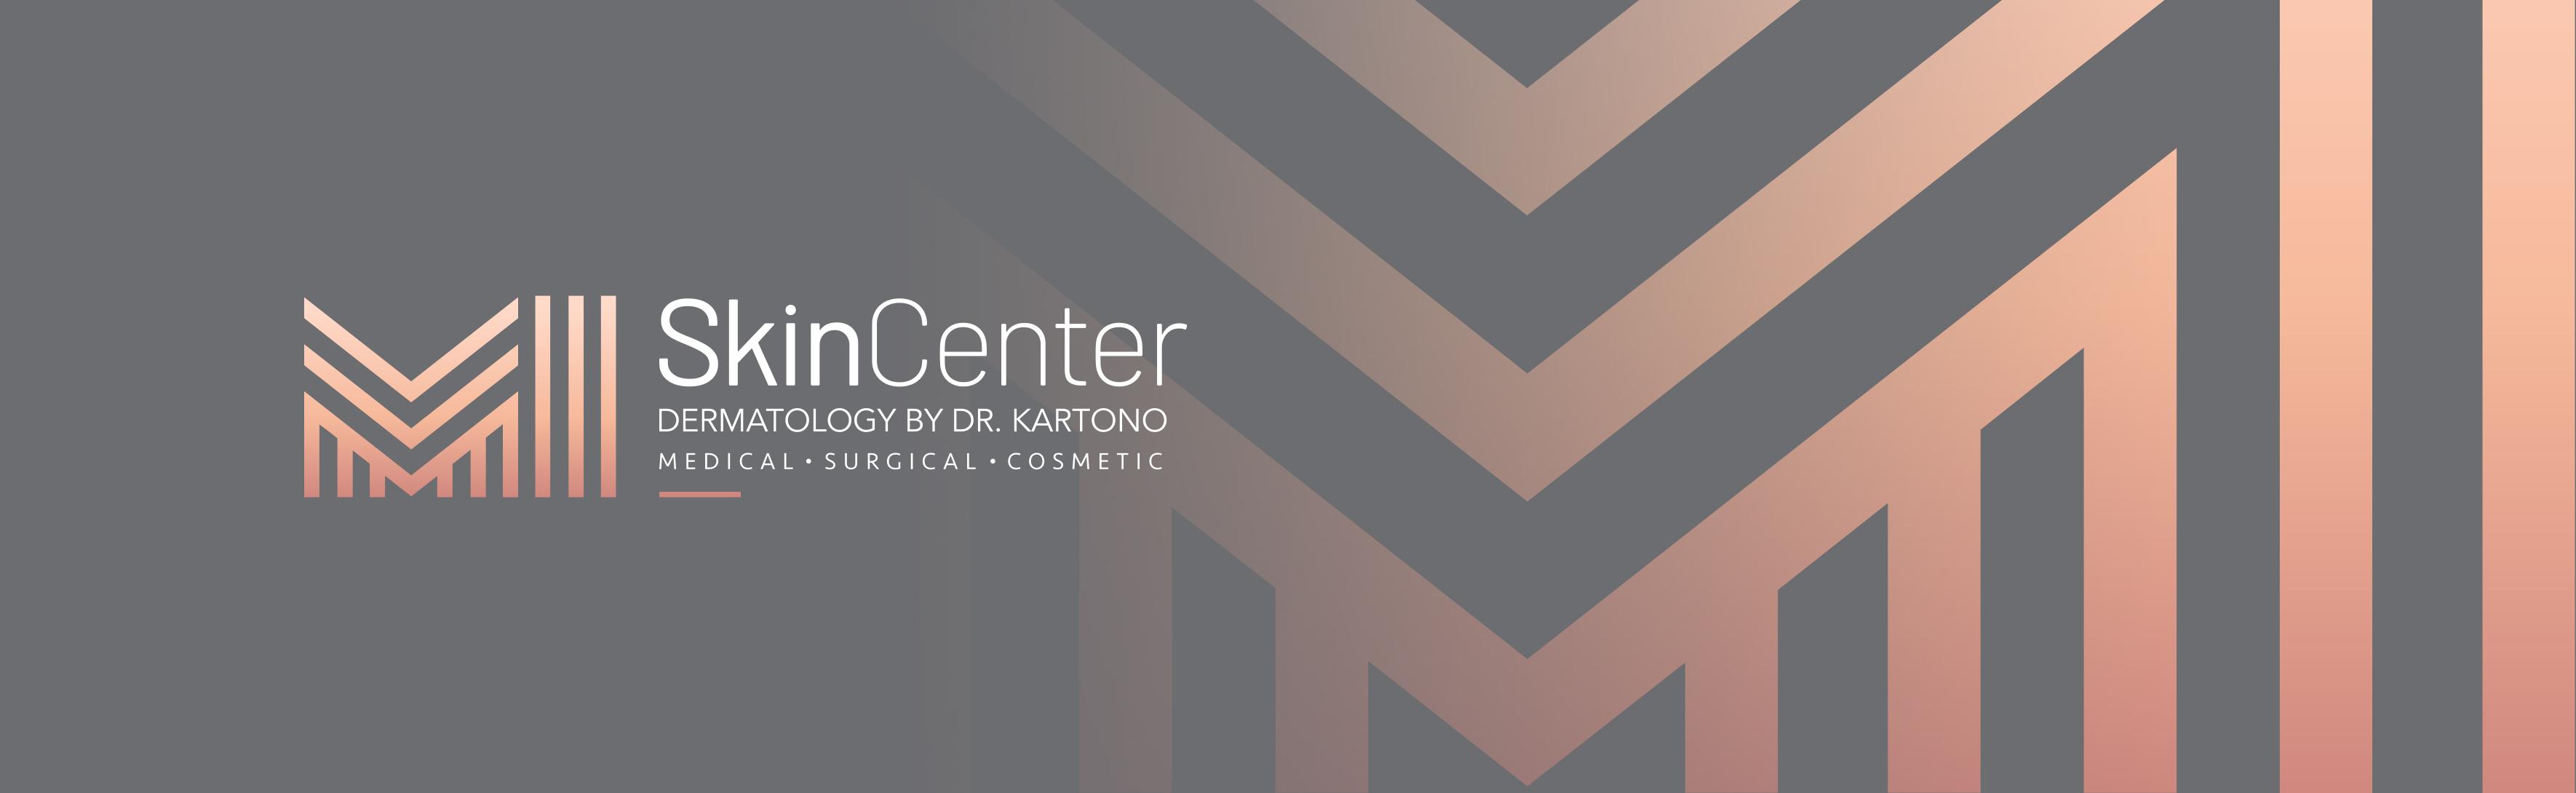 Dr. Francisca Kartono reviews   Dermatologists at 133 W Main Street, Suite 251 - Northville MI